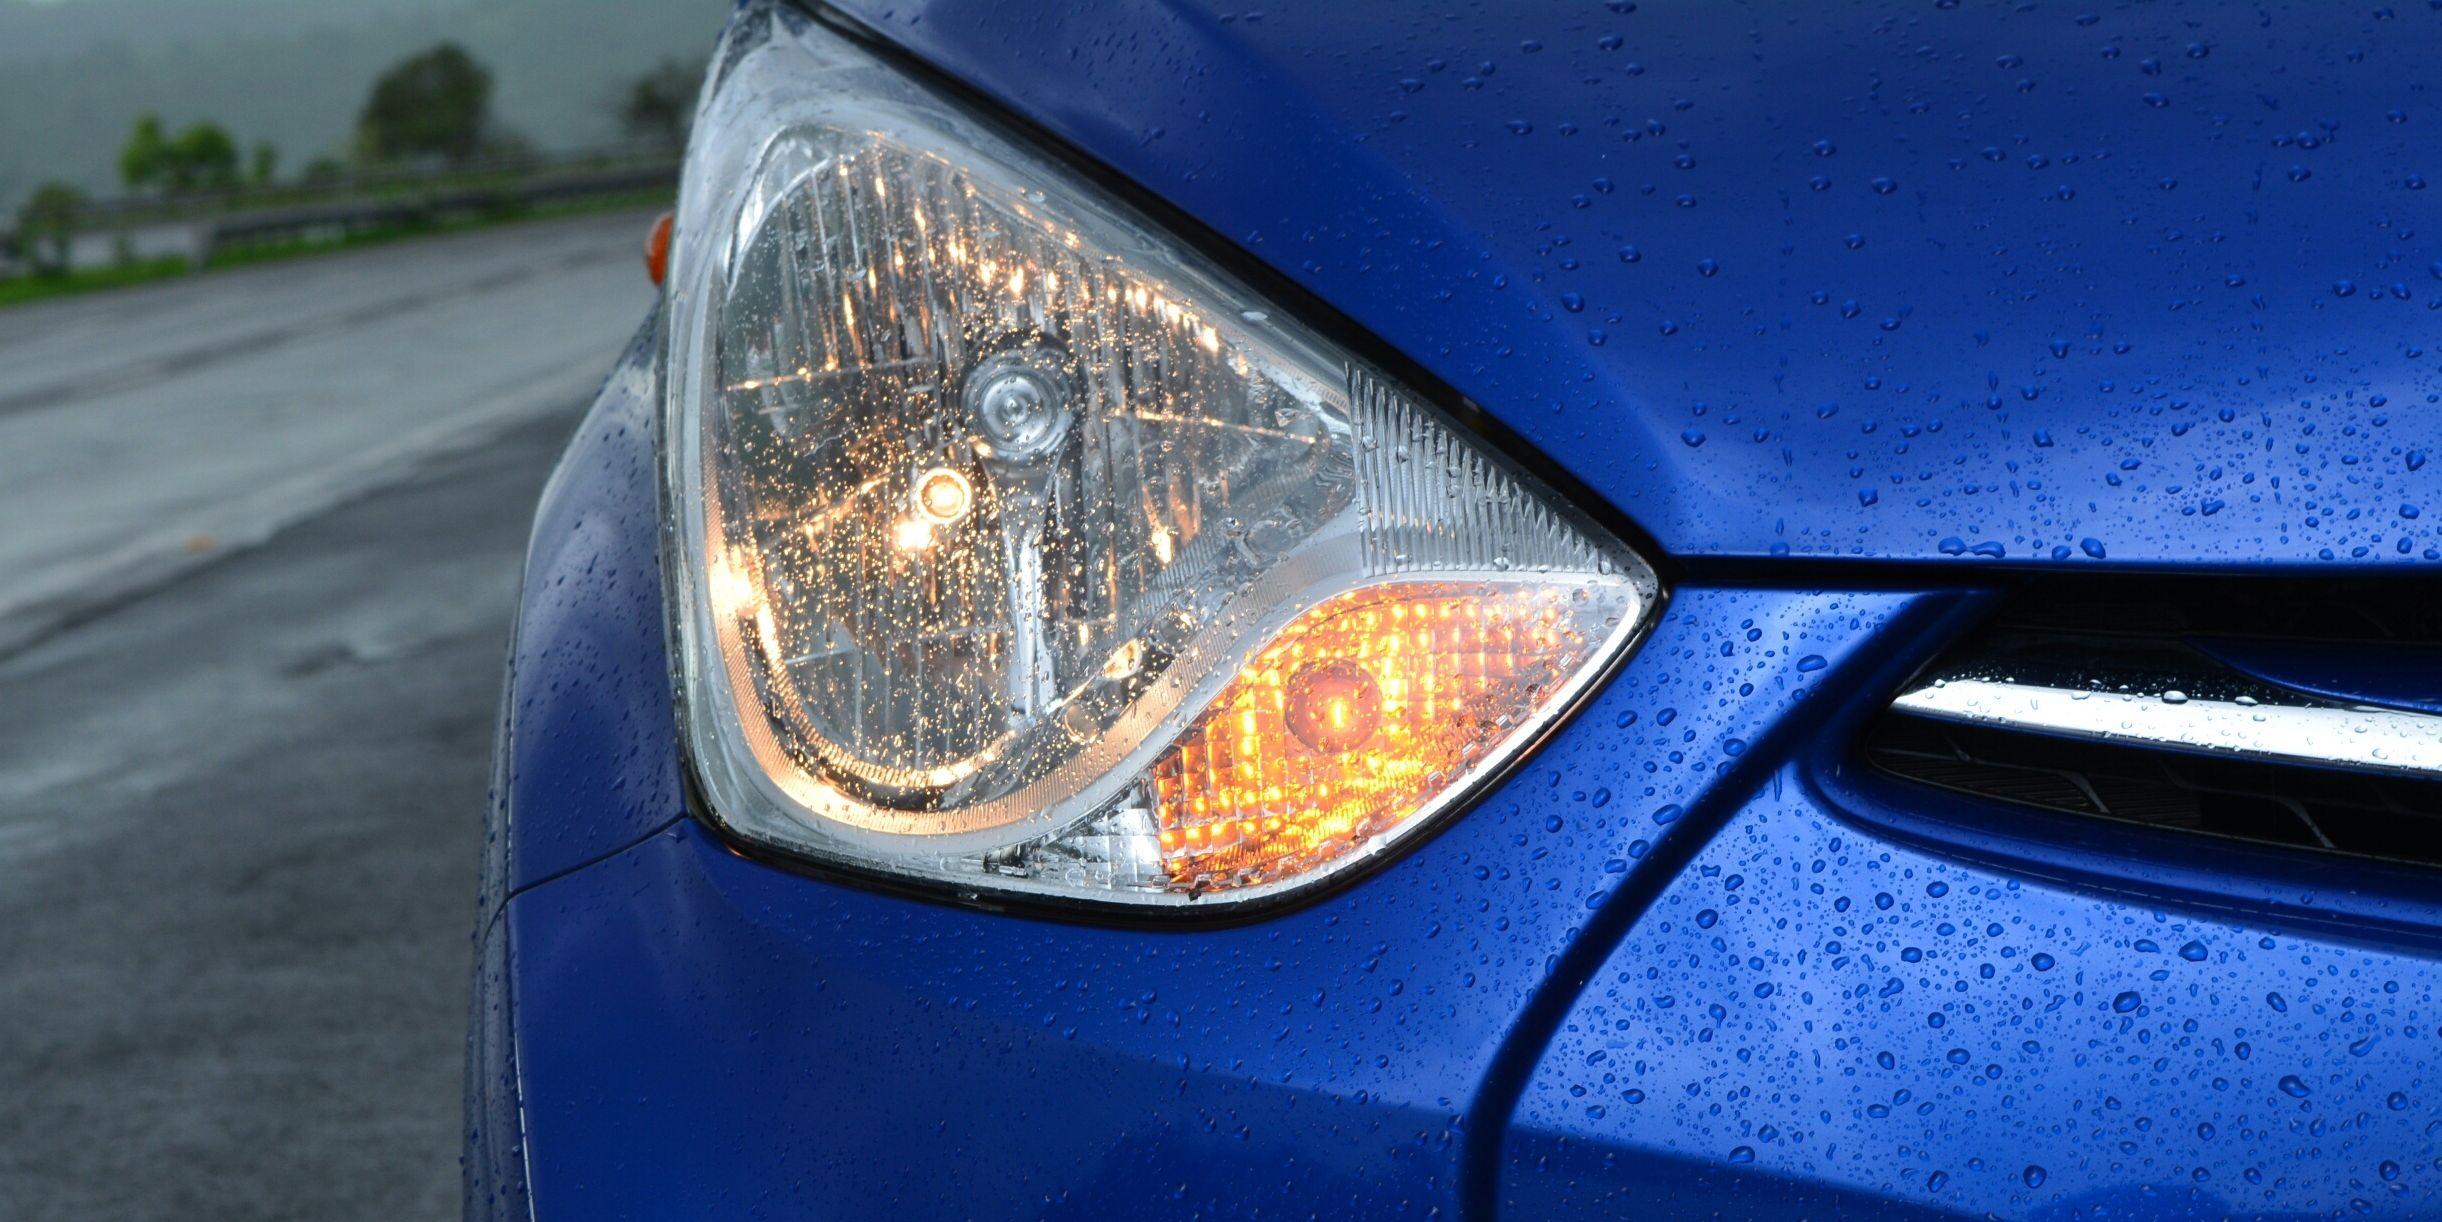 Close-Up Of Illuminated Car Headlight